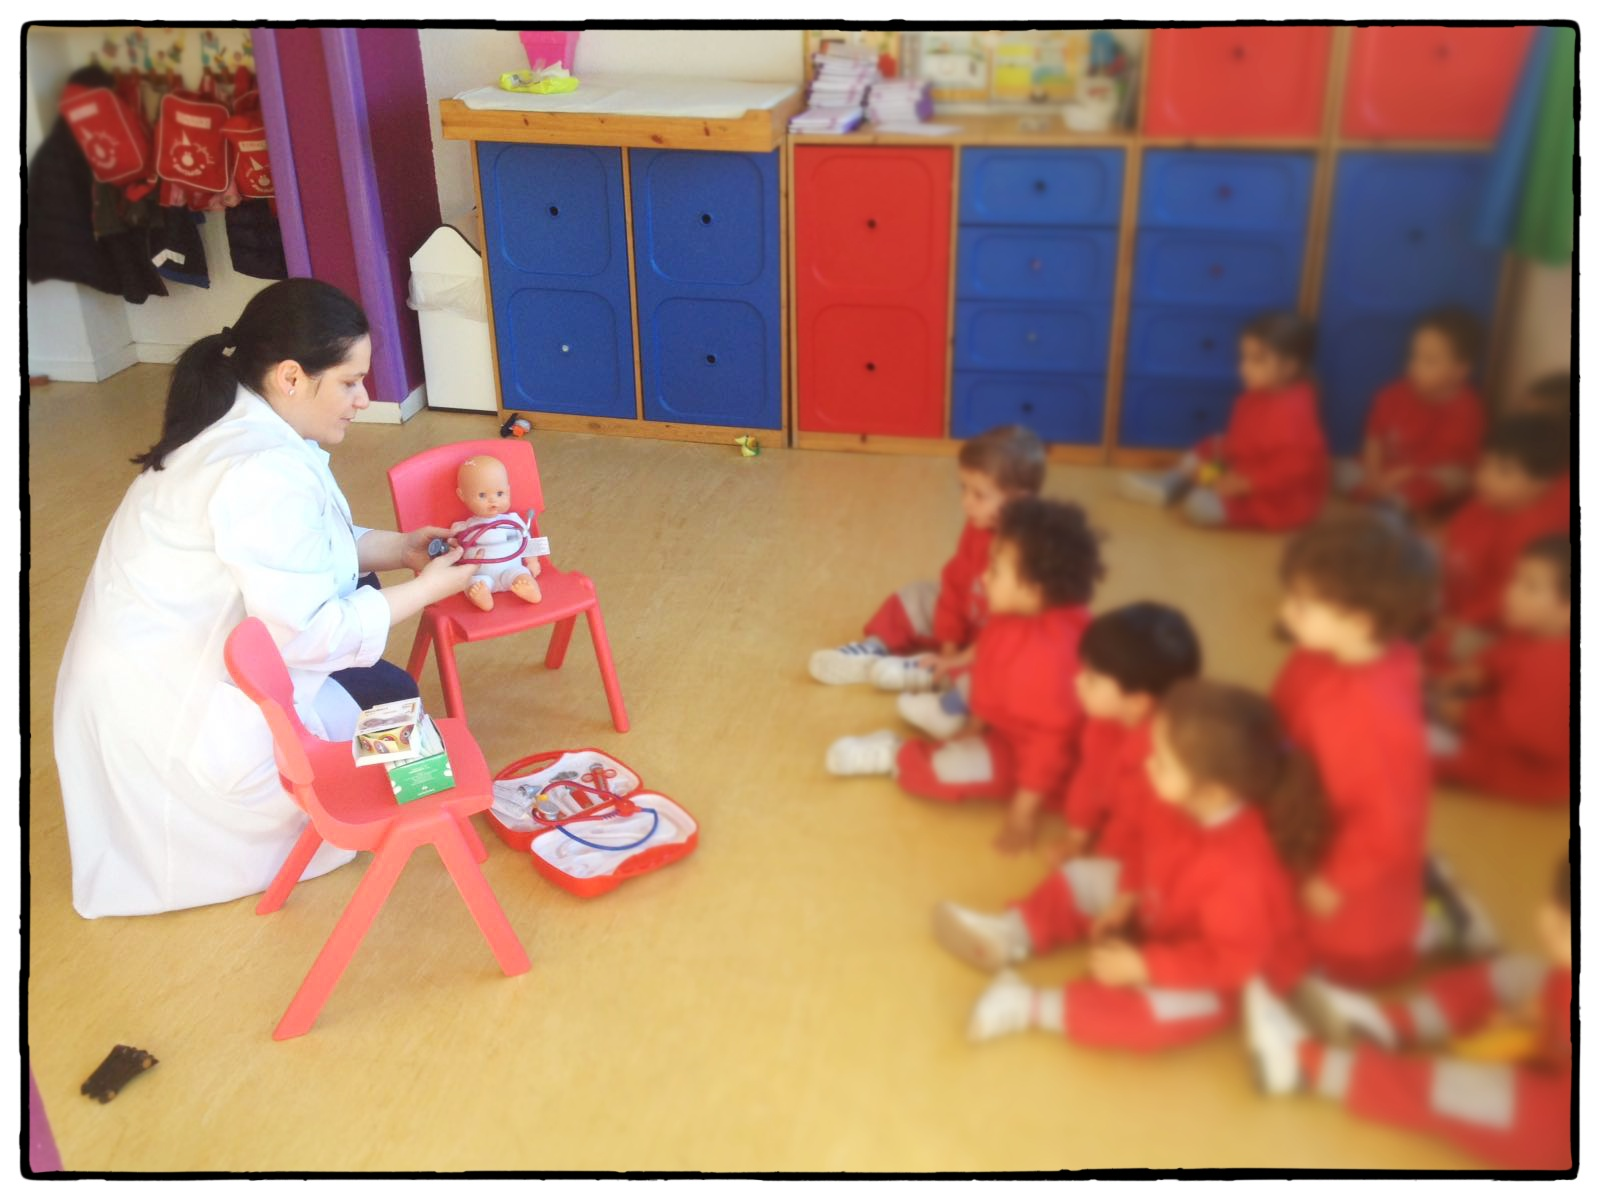 Escuela infantil piquio pozuelo pediatra visita piquio escuela infantil piquio pozuelo - Escuelas infantiles pozuelo ...